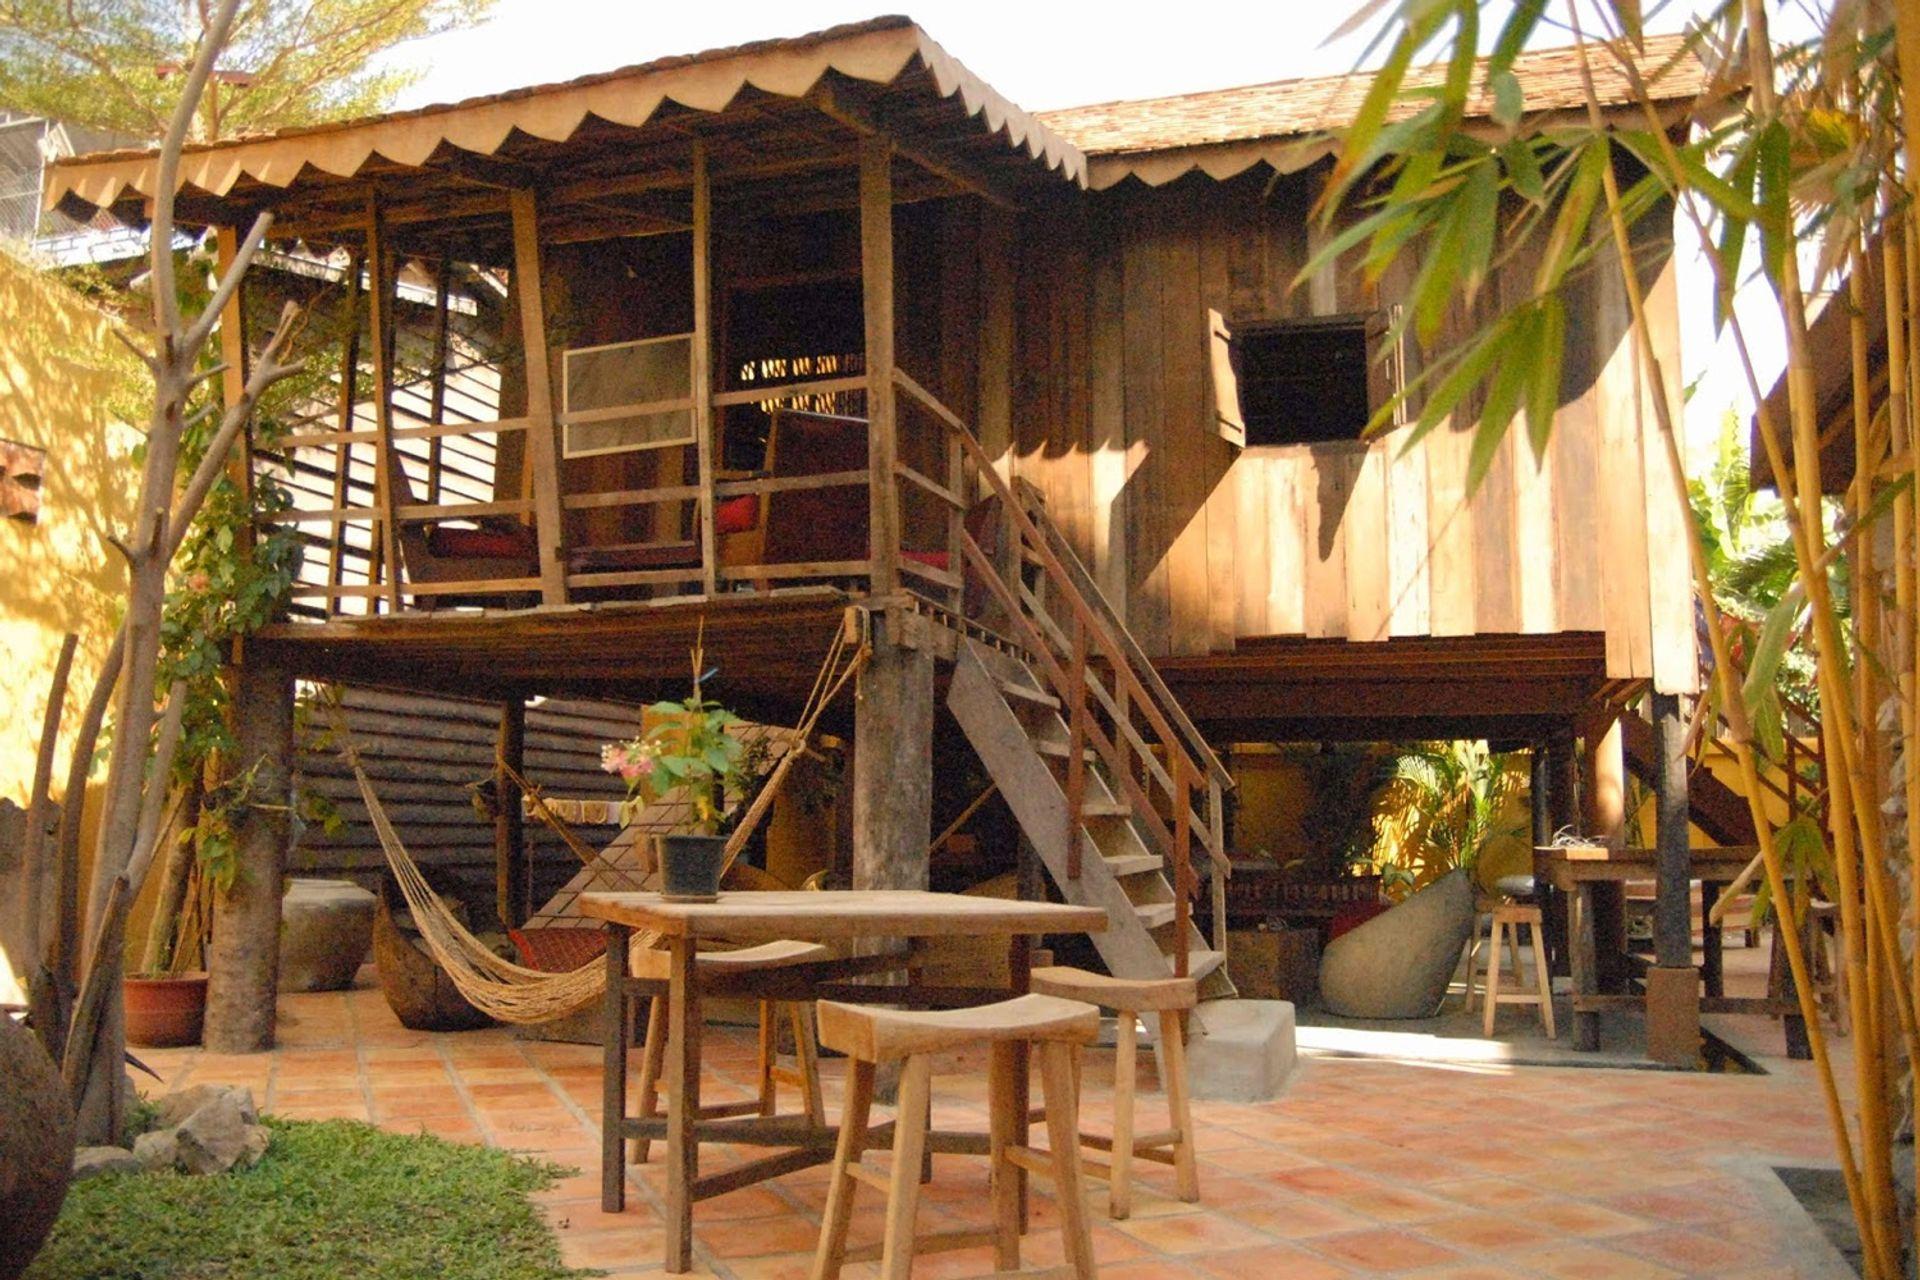 Quán bar Asana - Campuchian House